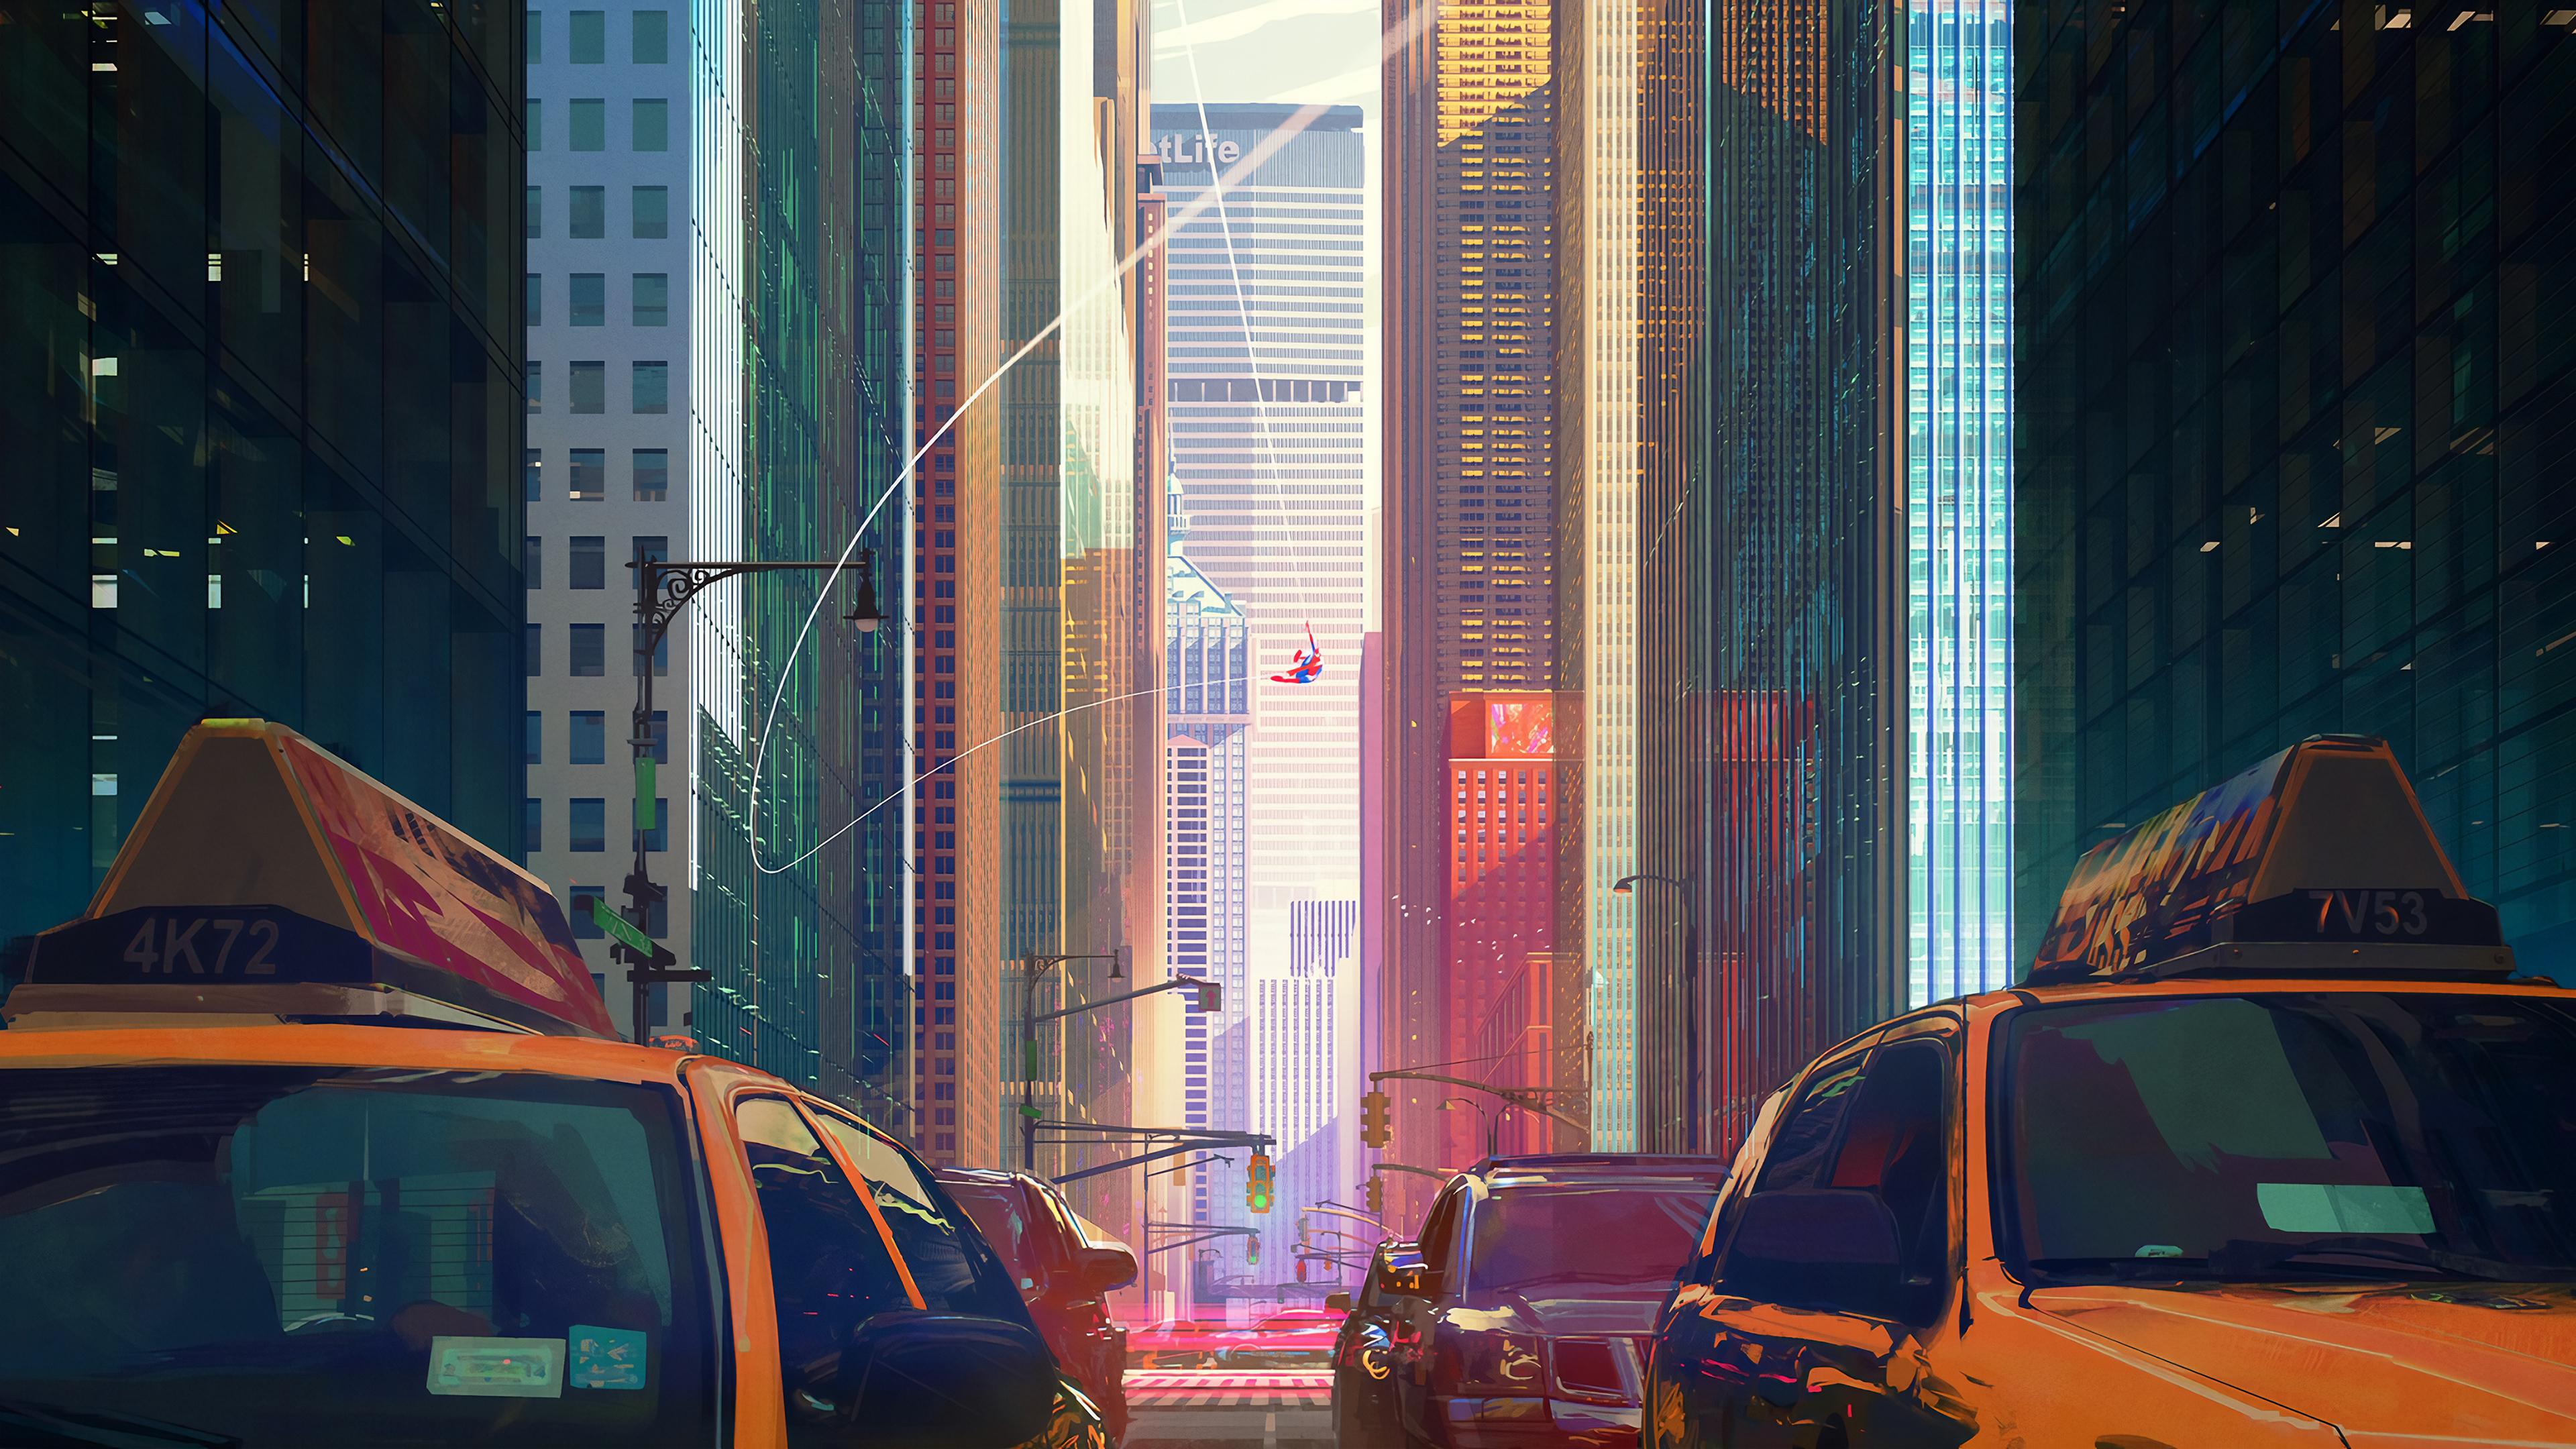 spiderman city buildings 4k 1554244896 - Spiderman City Buildings 4k - superheroes wallpapers, spiderman wallpapers, spiderman into the spider verse wallpapers, hd-wallpapers, digital art wallpapers, artwork wallpapers, artstation wallpapers, artist wallpapers, 4k-wallpapers